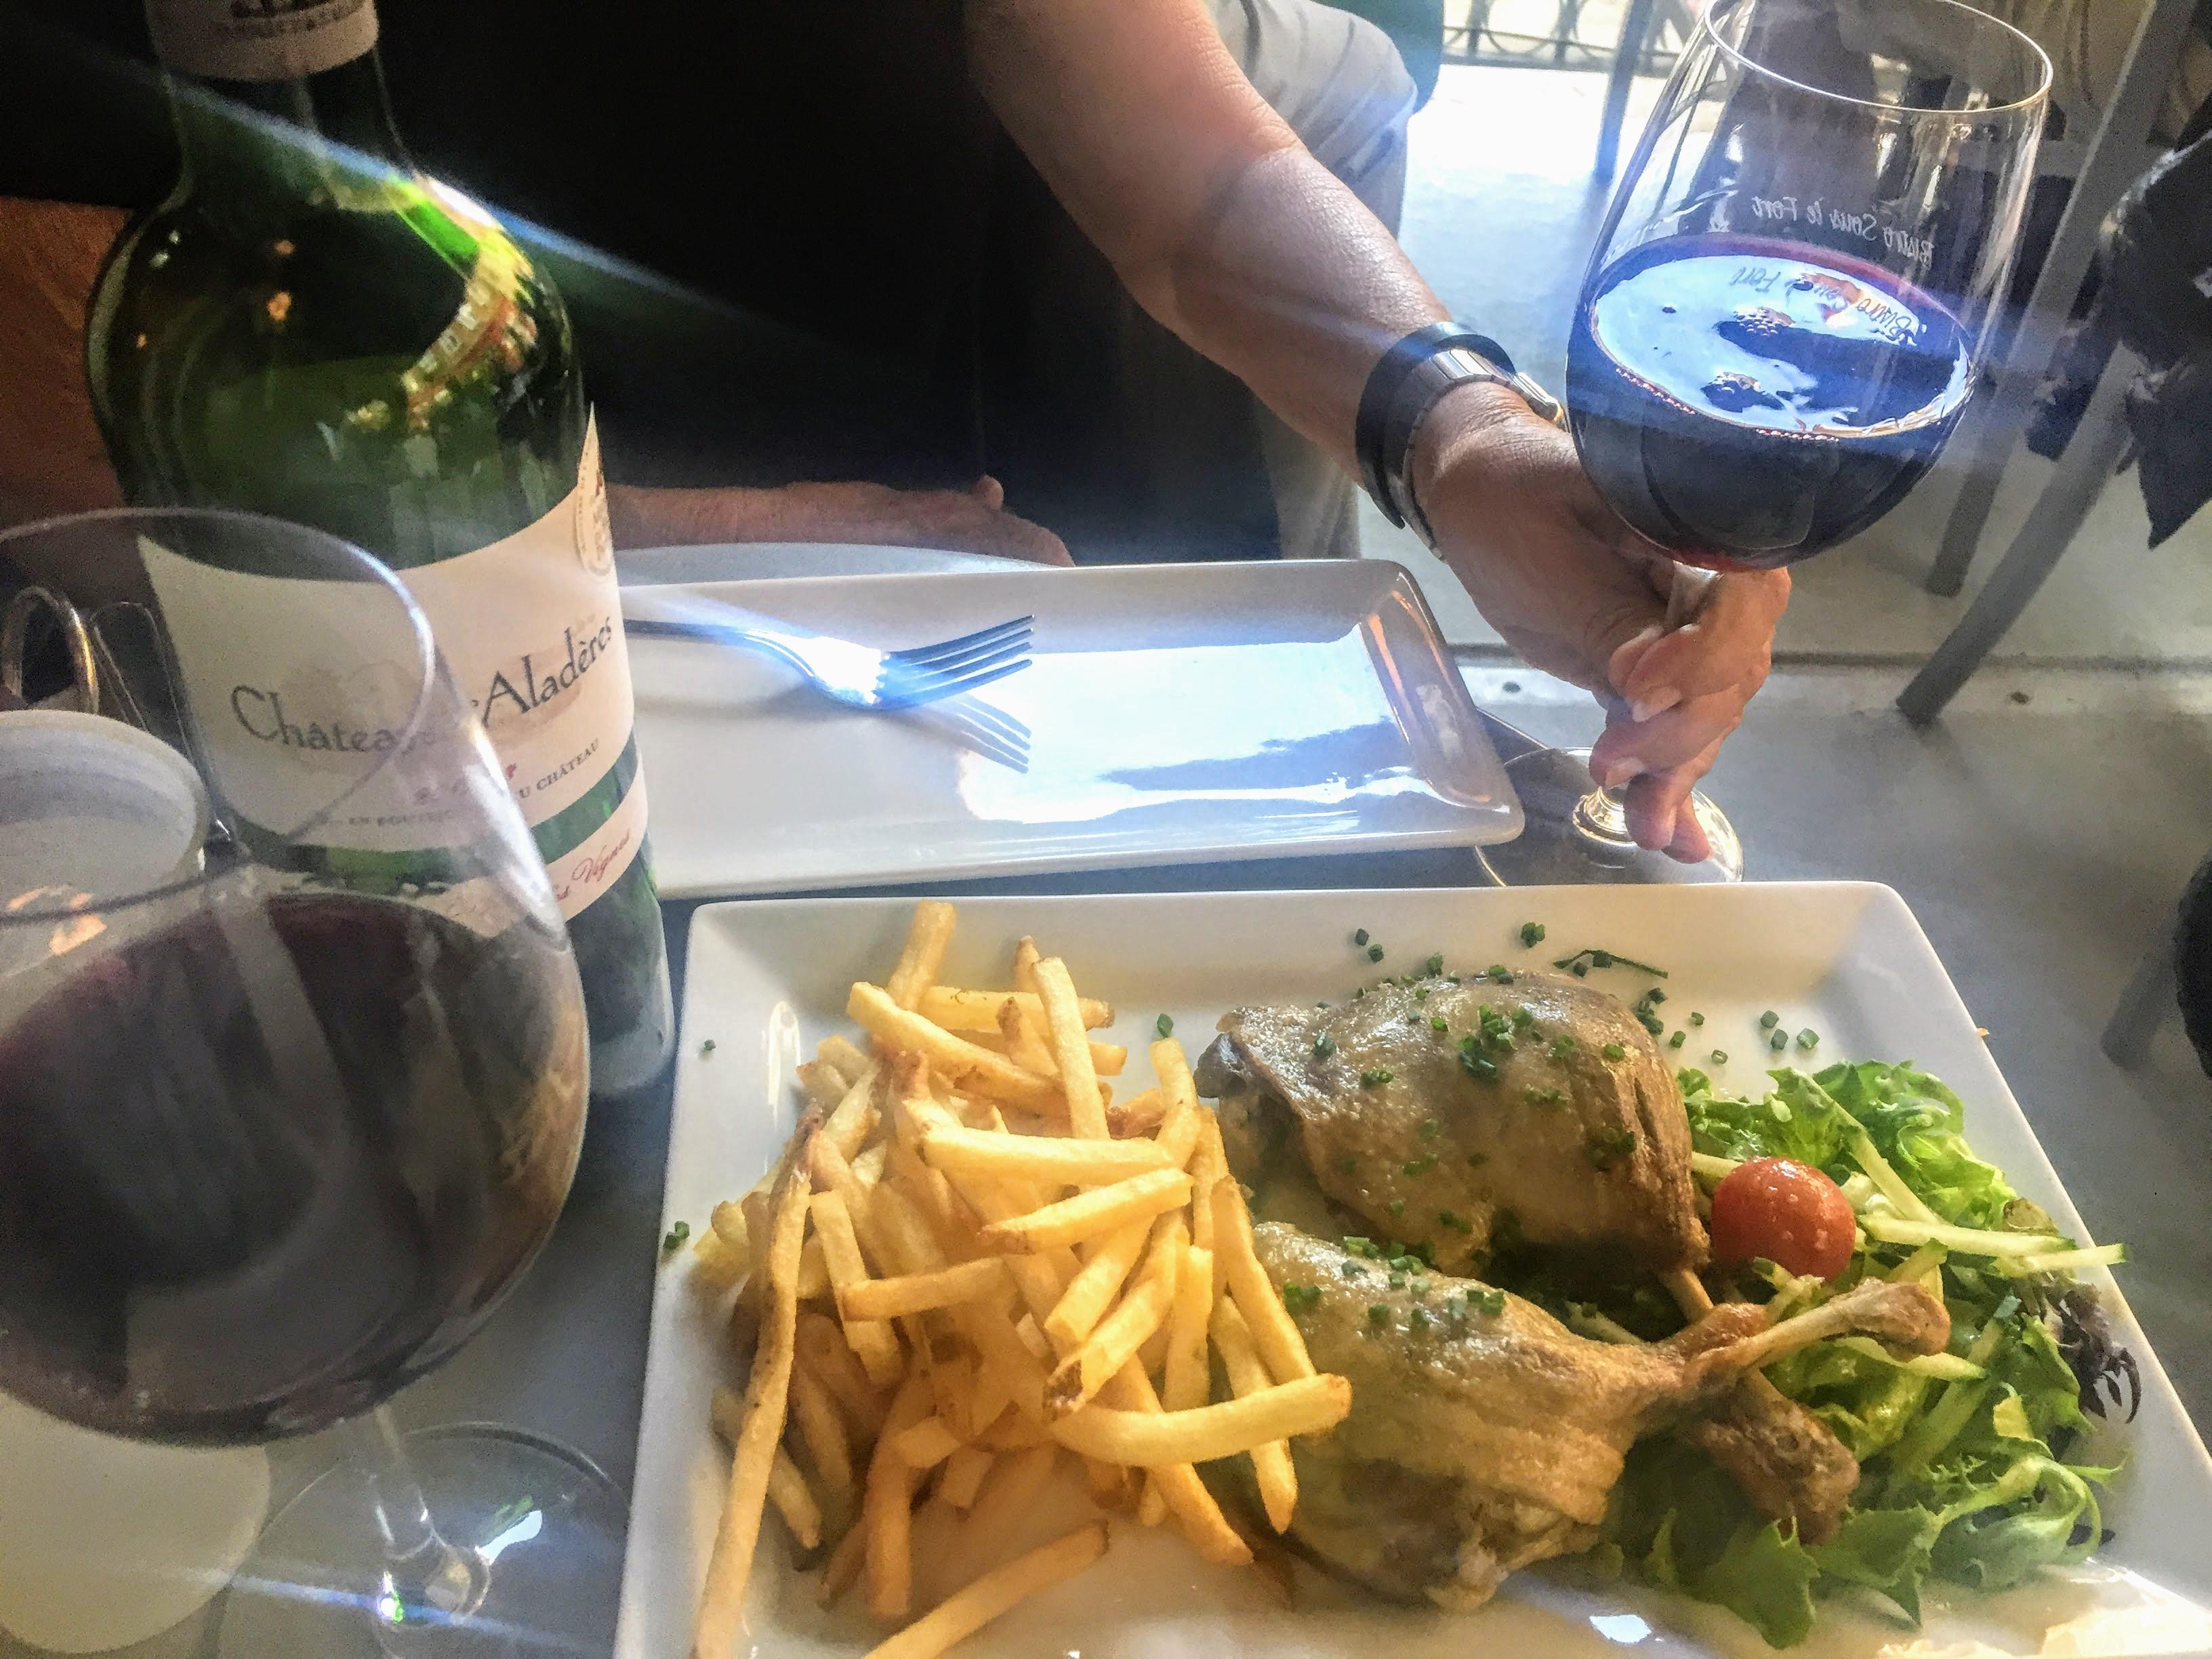 2017-08-17 Quebec - Lunch 01